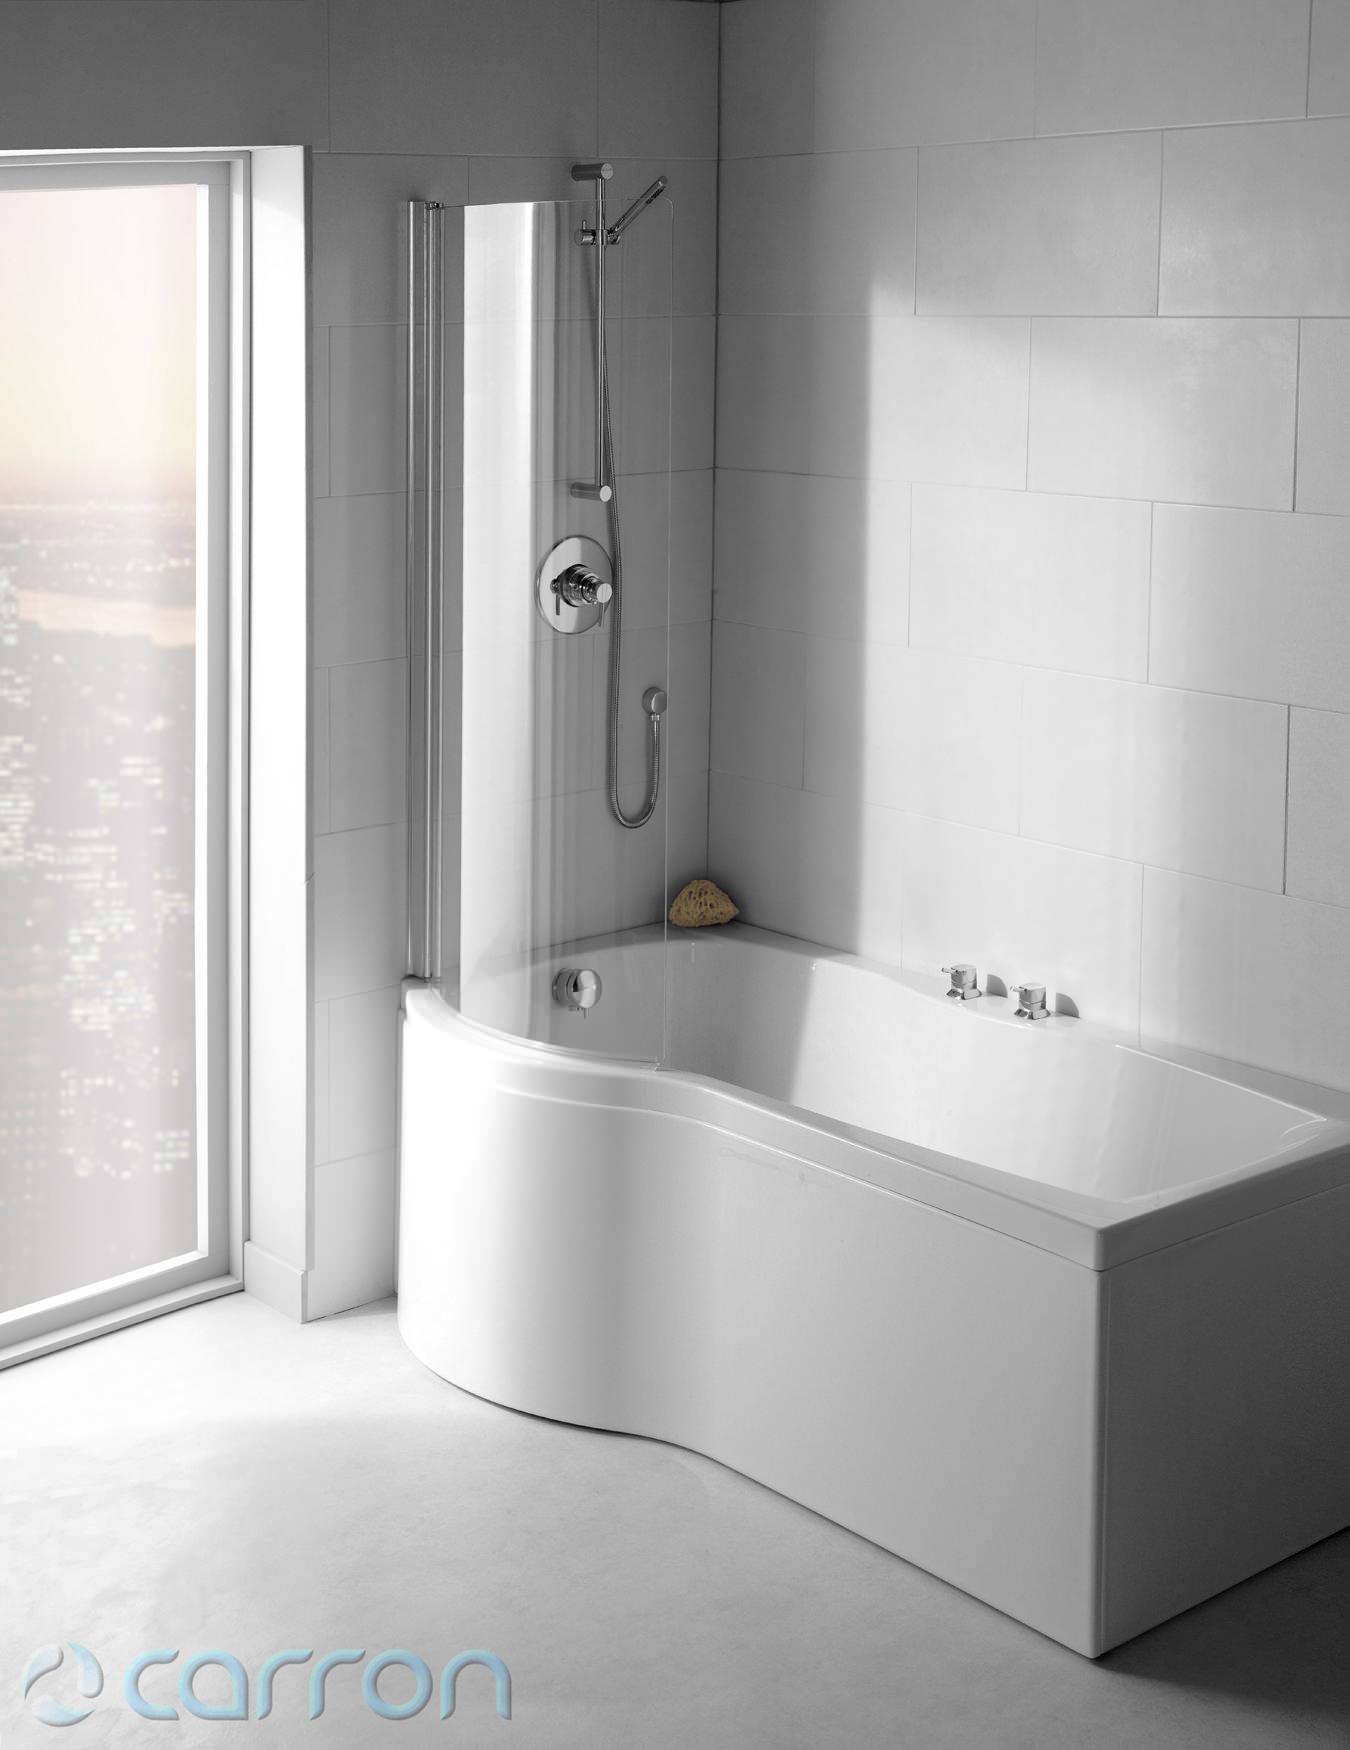 carron sigma right hand shower bath 1800 x 900mm